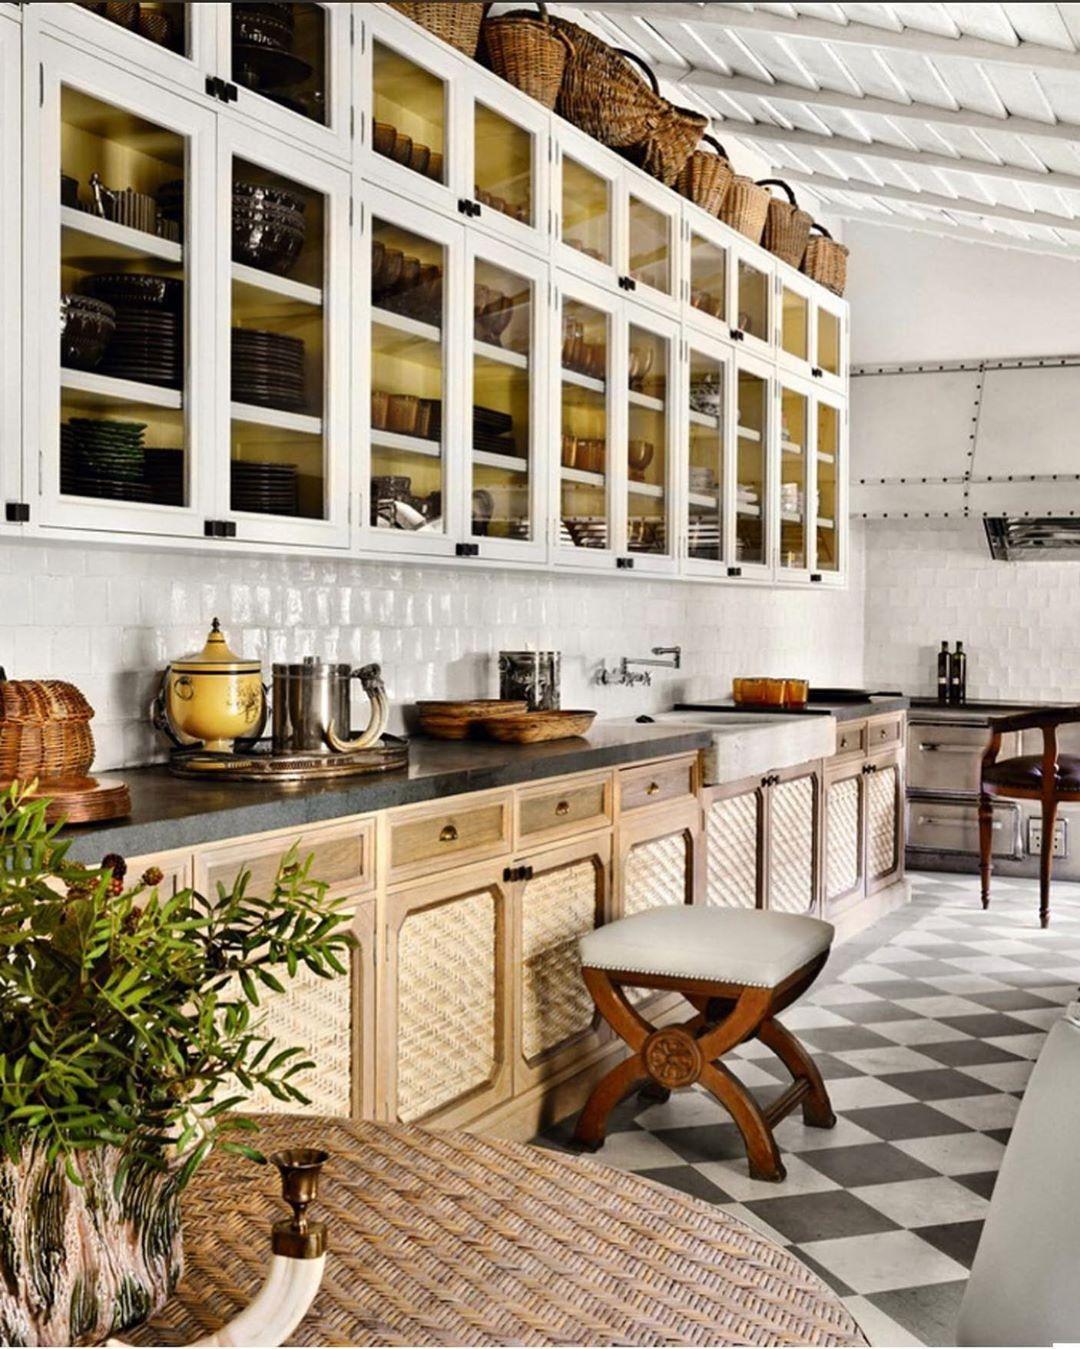 Decorator Dealer On Instagram Lorenzocastillofe Decorator Design Chic T In 2020 Country Kitchen Designs Kitchen Design Beautiful Kitchens